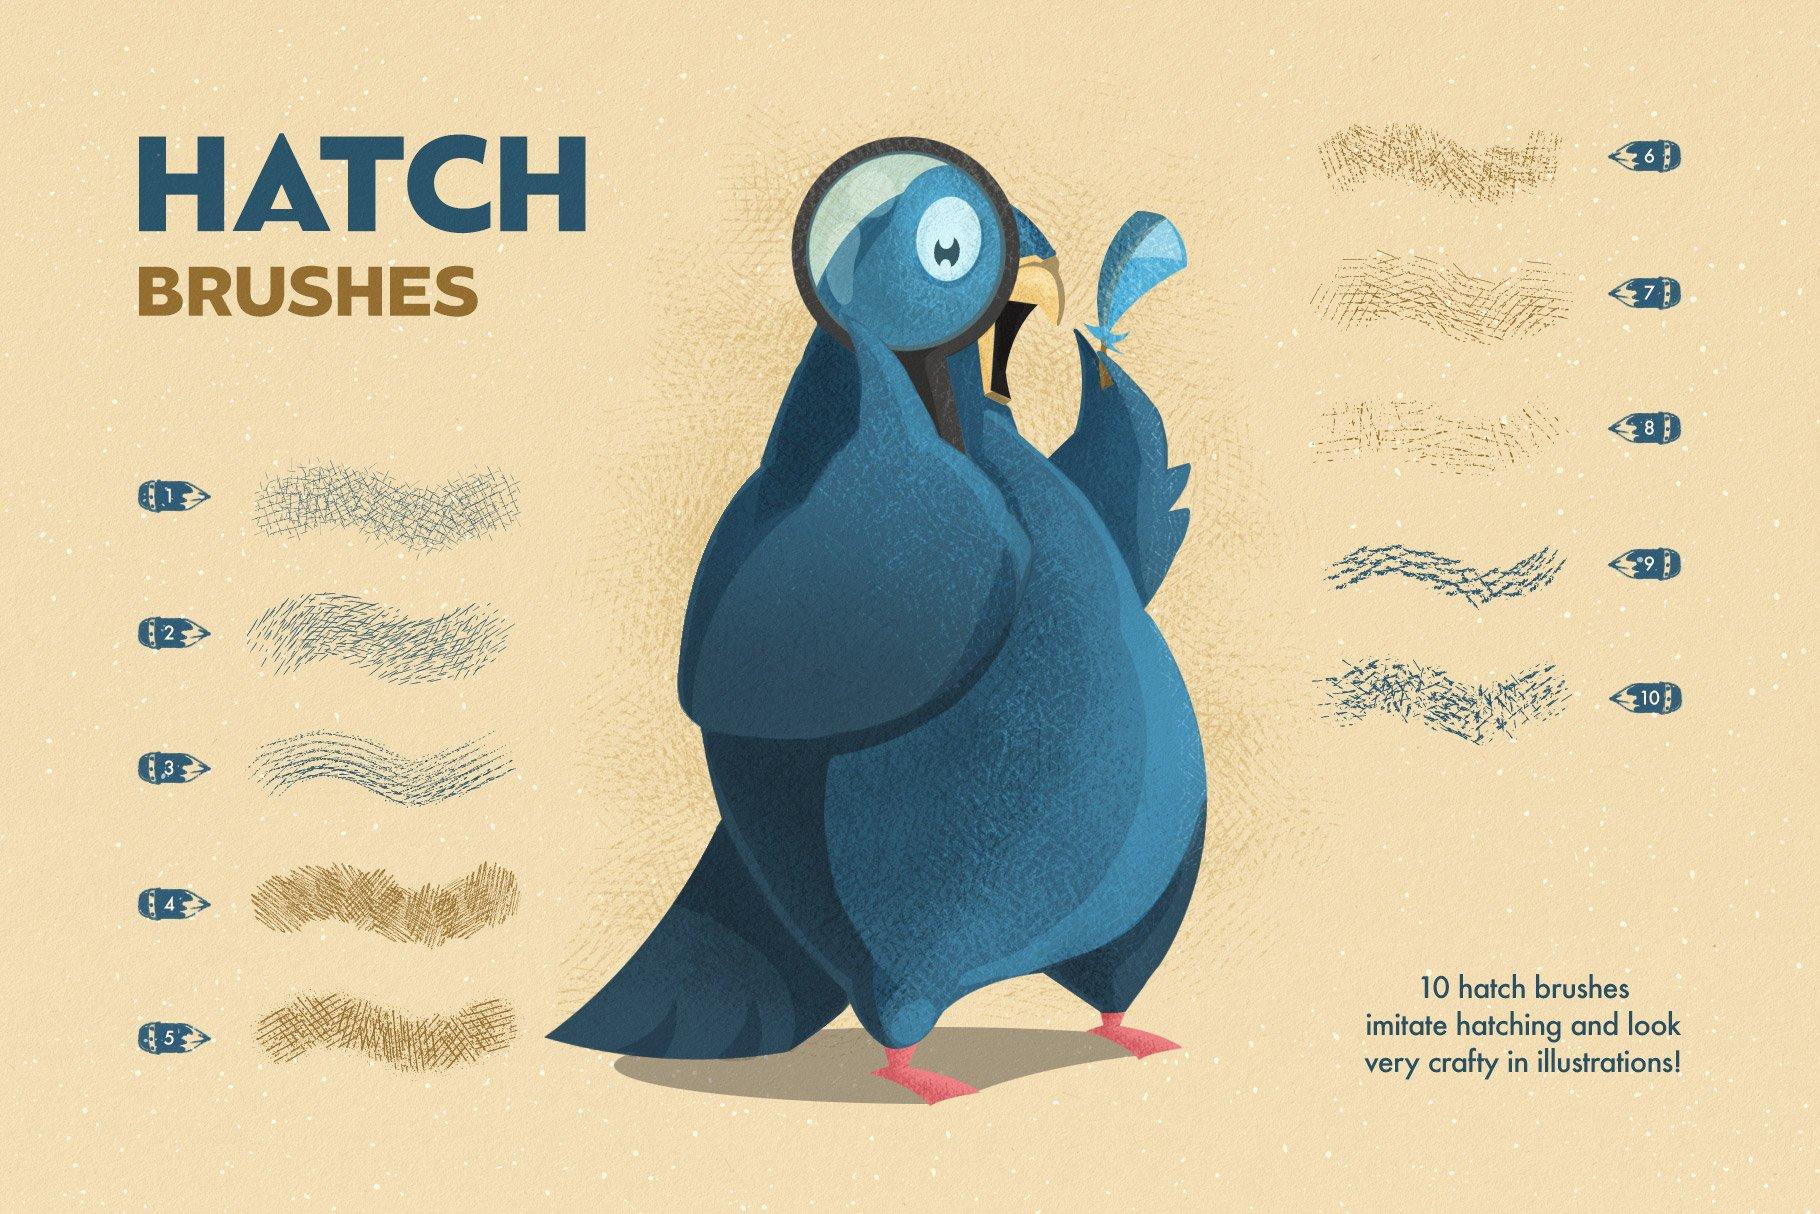 6 hatch brushes 7